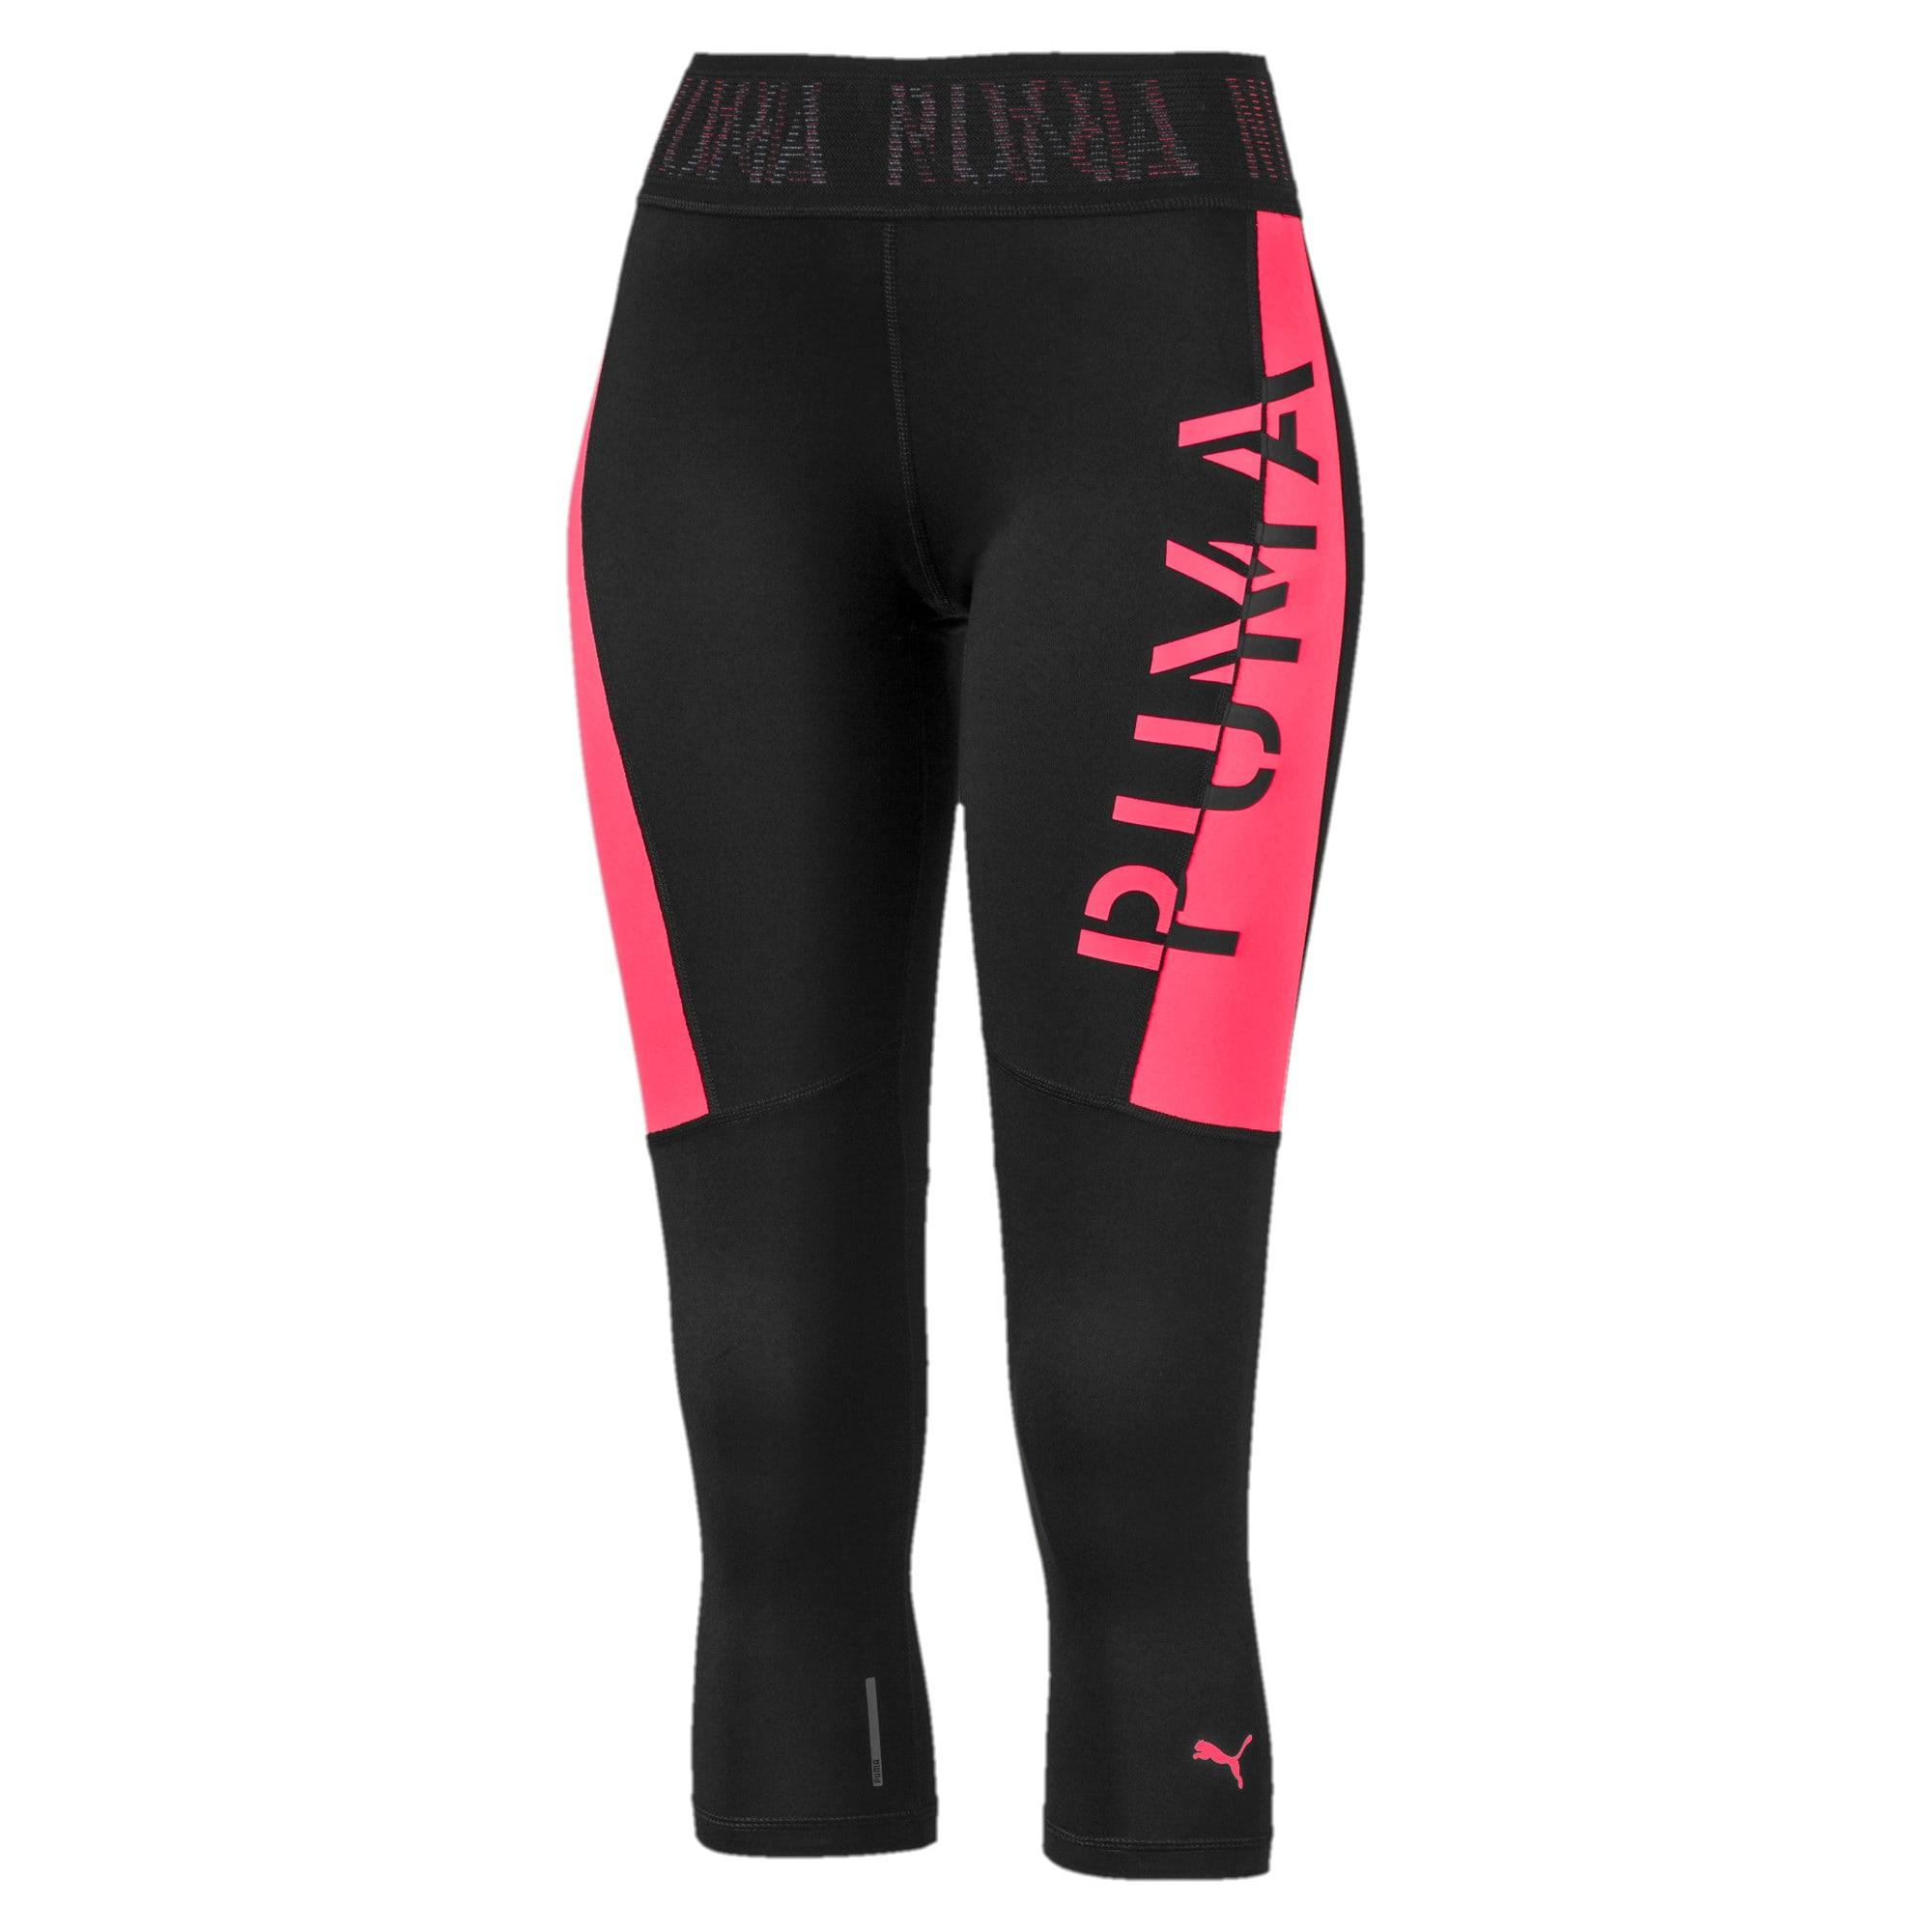 Thumbnail 1 of Logo Women's 3/4 Leggings, Puma Black-Pink Alert, medium